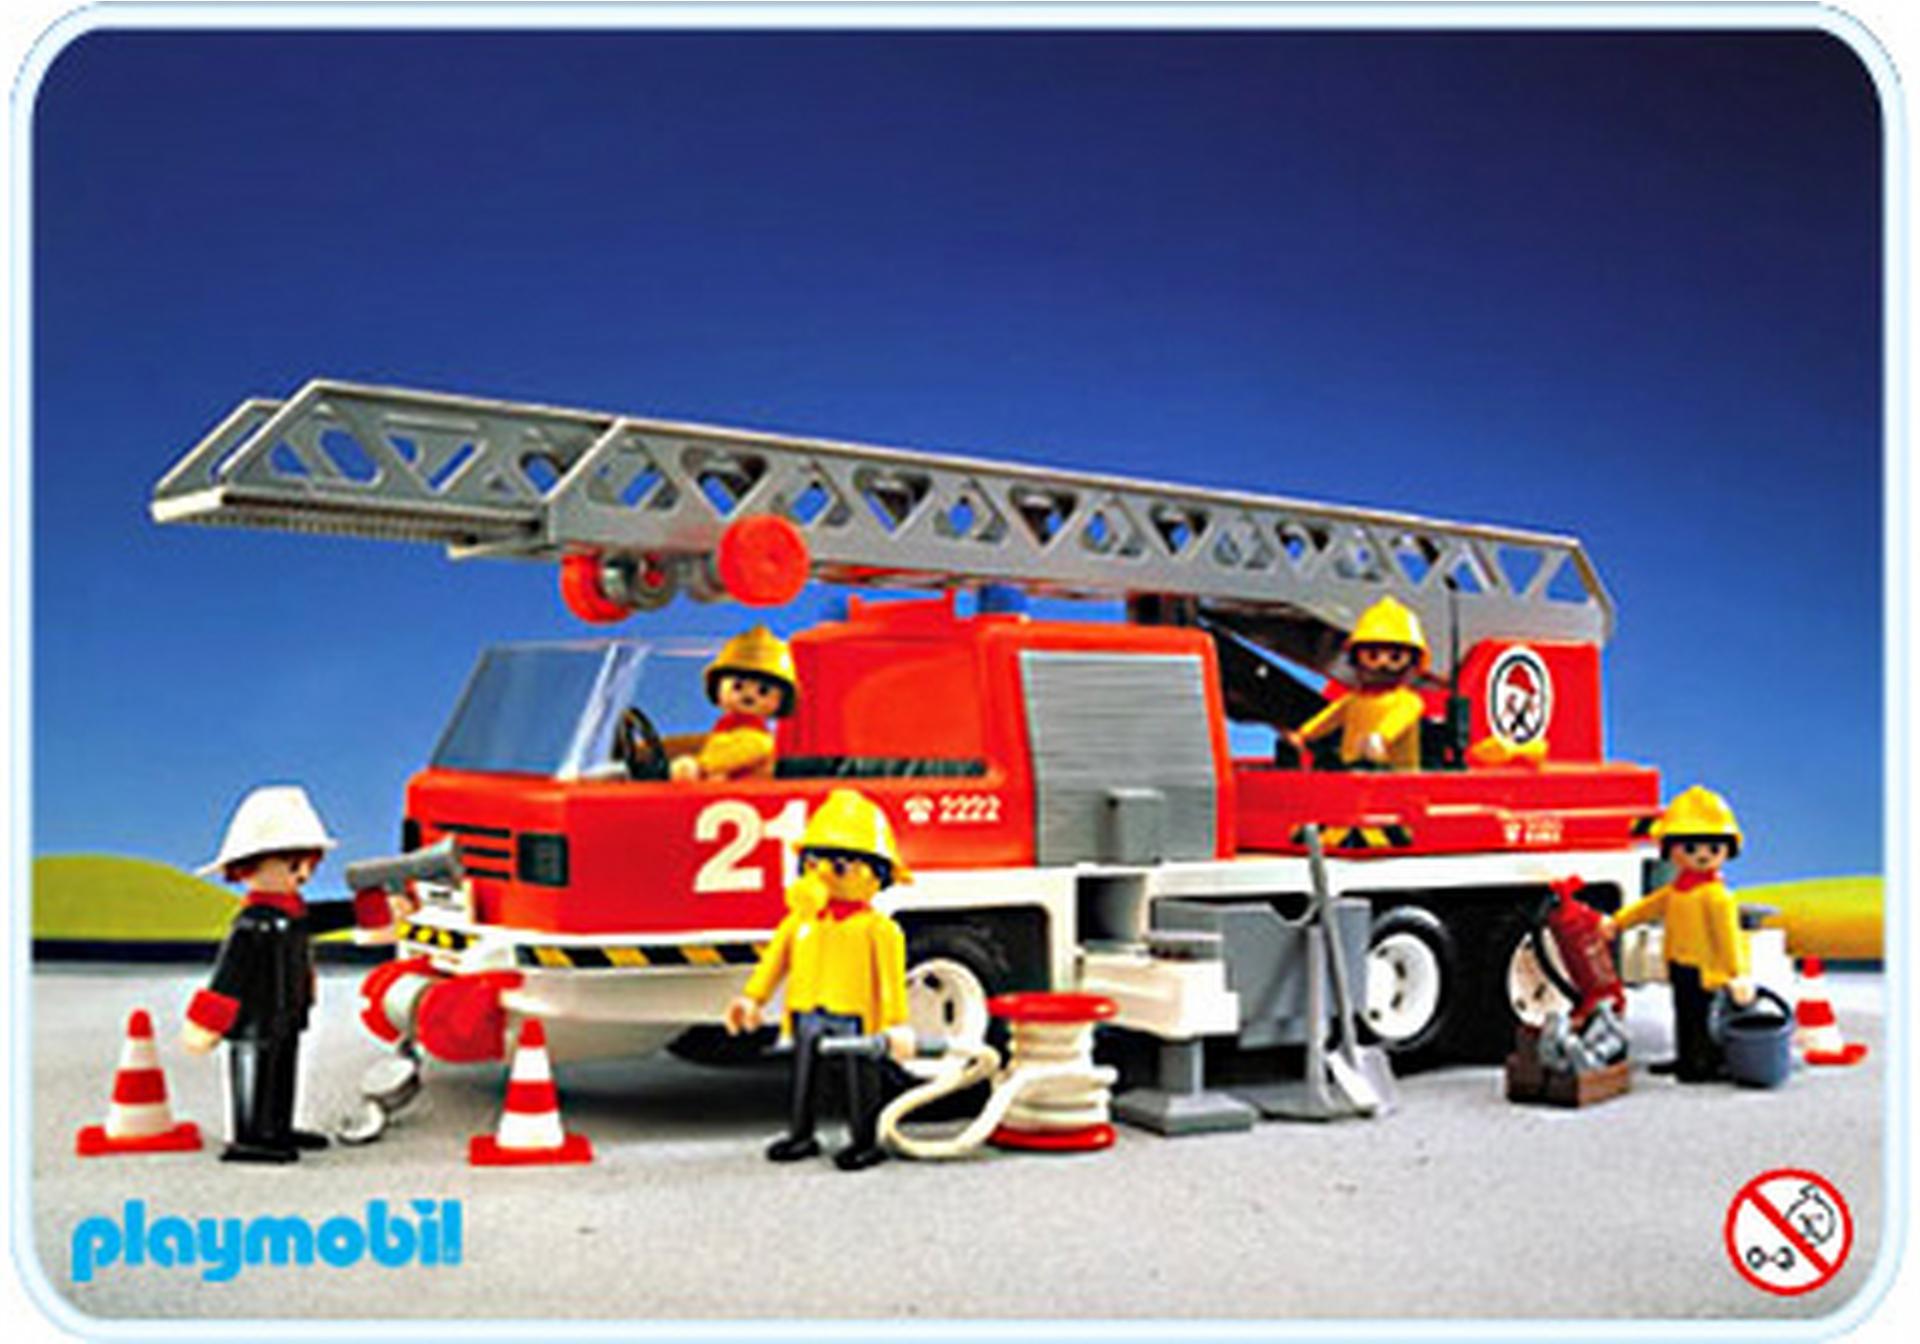 camion pompiers 3781 a playmobil france. Black Bedroom Furniture Sets. Home Design Ideas